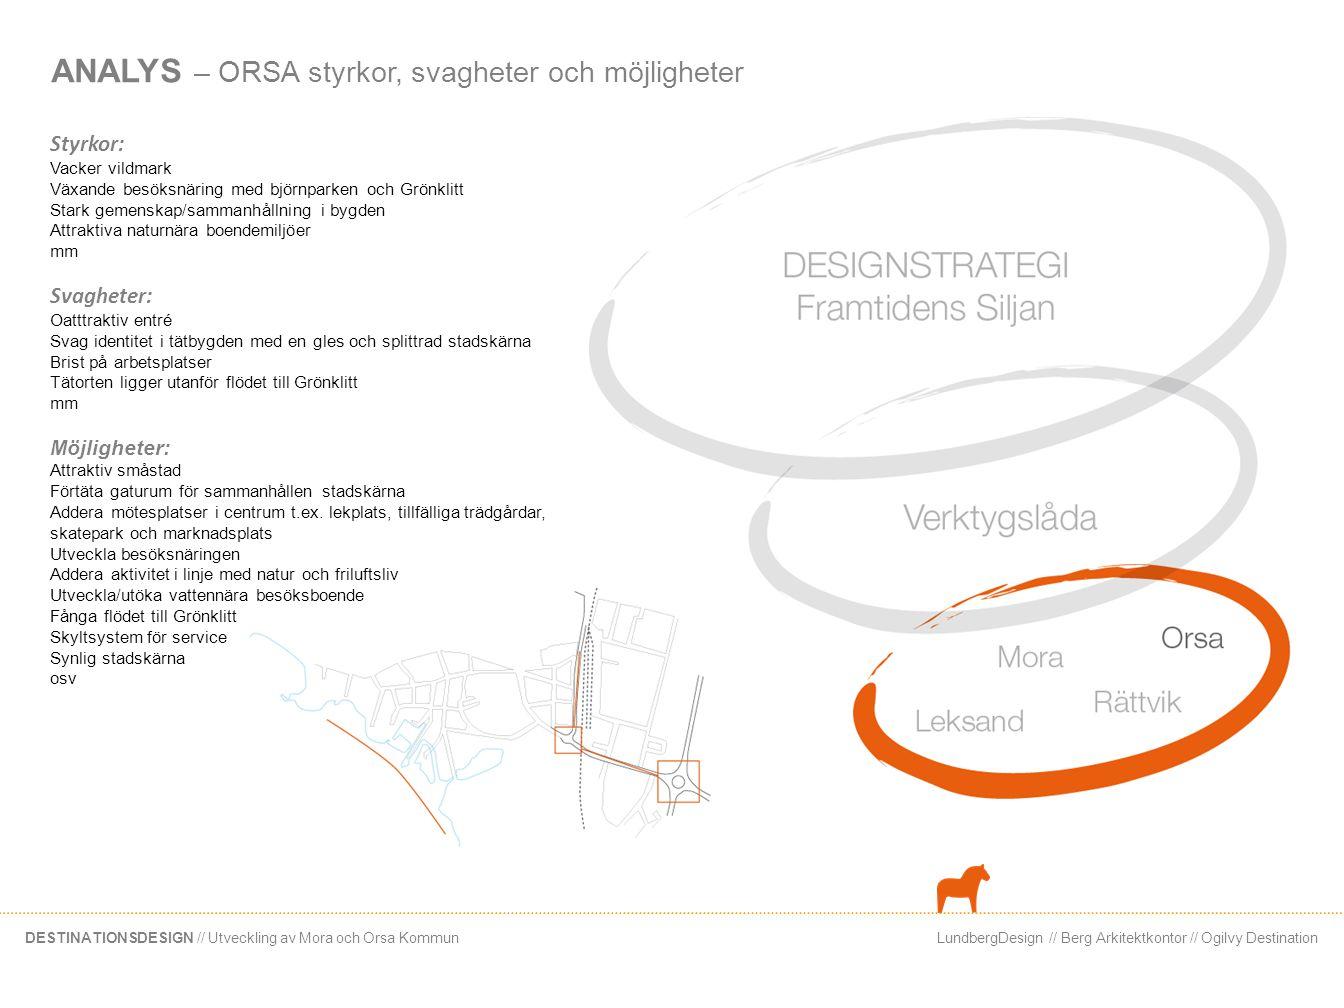 LundbergDesign // Berg Arkitektkontor // Ogilvy DestinationDESTINATIONSDESIGN // Utveckling av Mora och Orsa Kommun ANALYS – ORSA styrkor, svagheter o